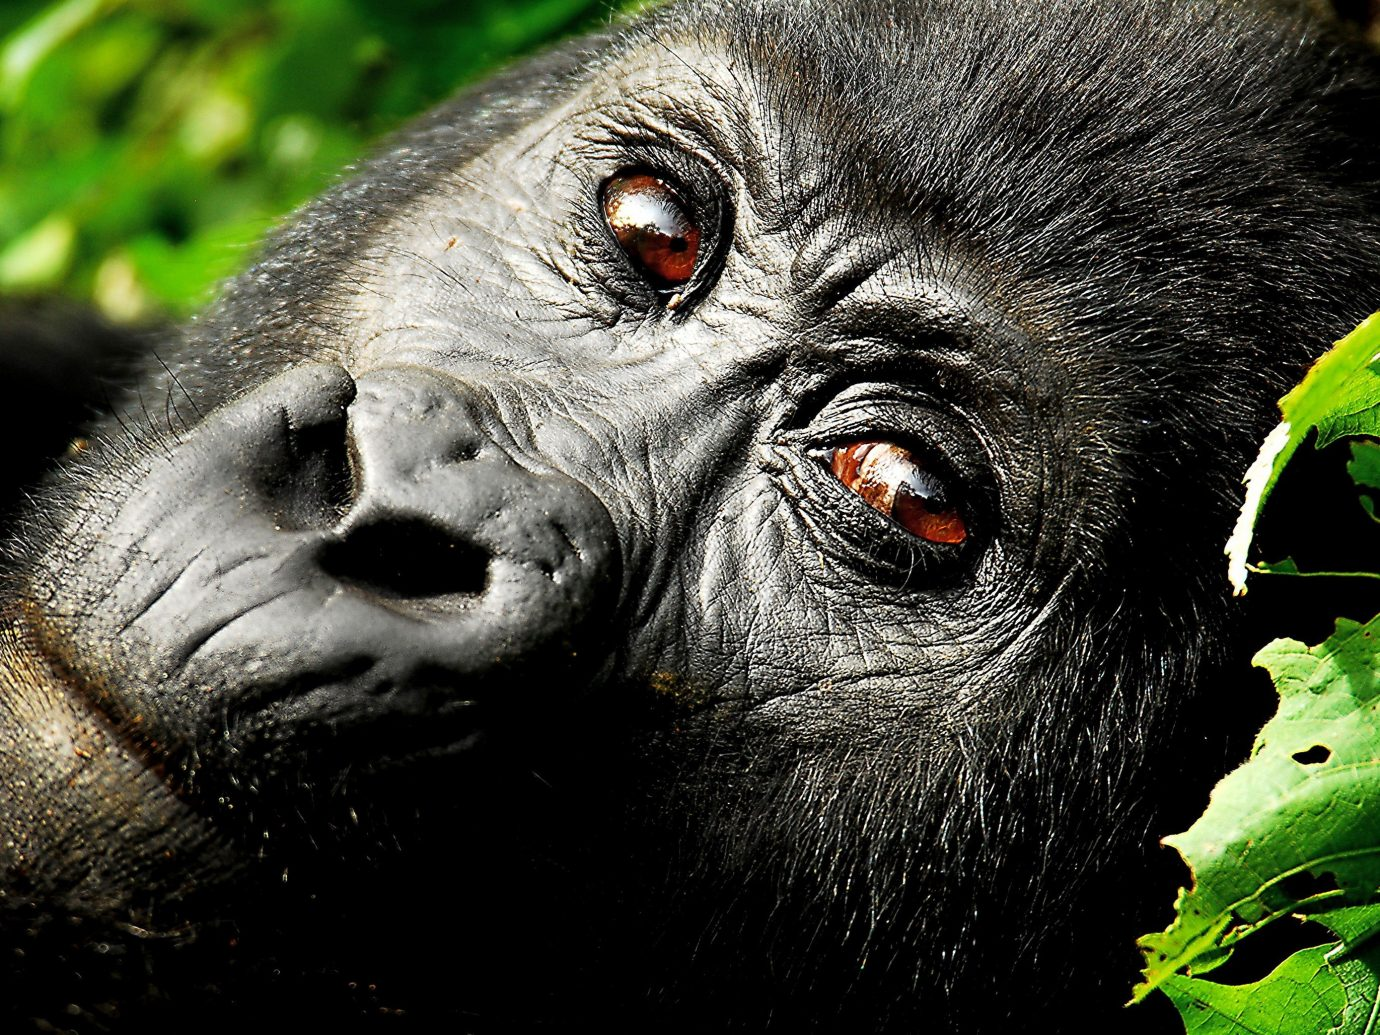 Trip Ideas animal western gorilla great ape mammal vertebrate primate looking chimpanzee ape black fauna Wildlife common chimpanzee green eyes zoo close staring